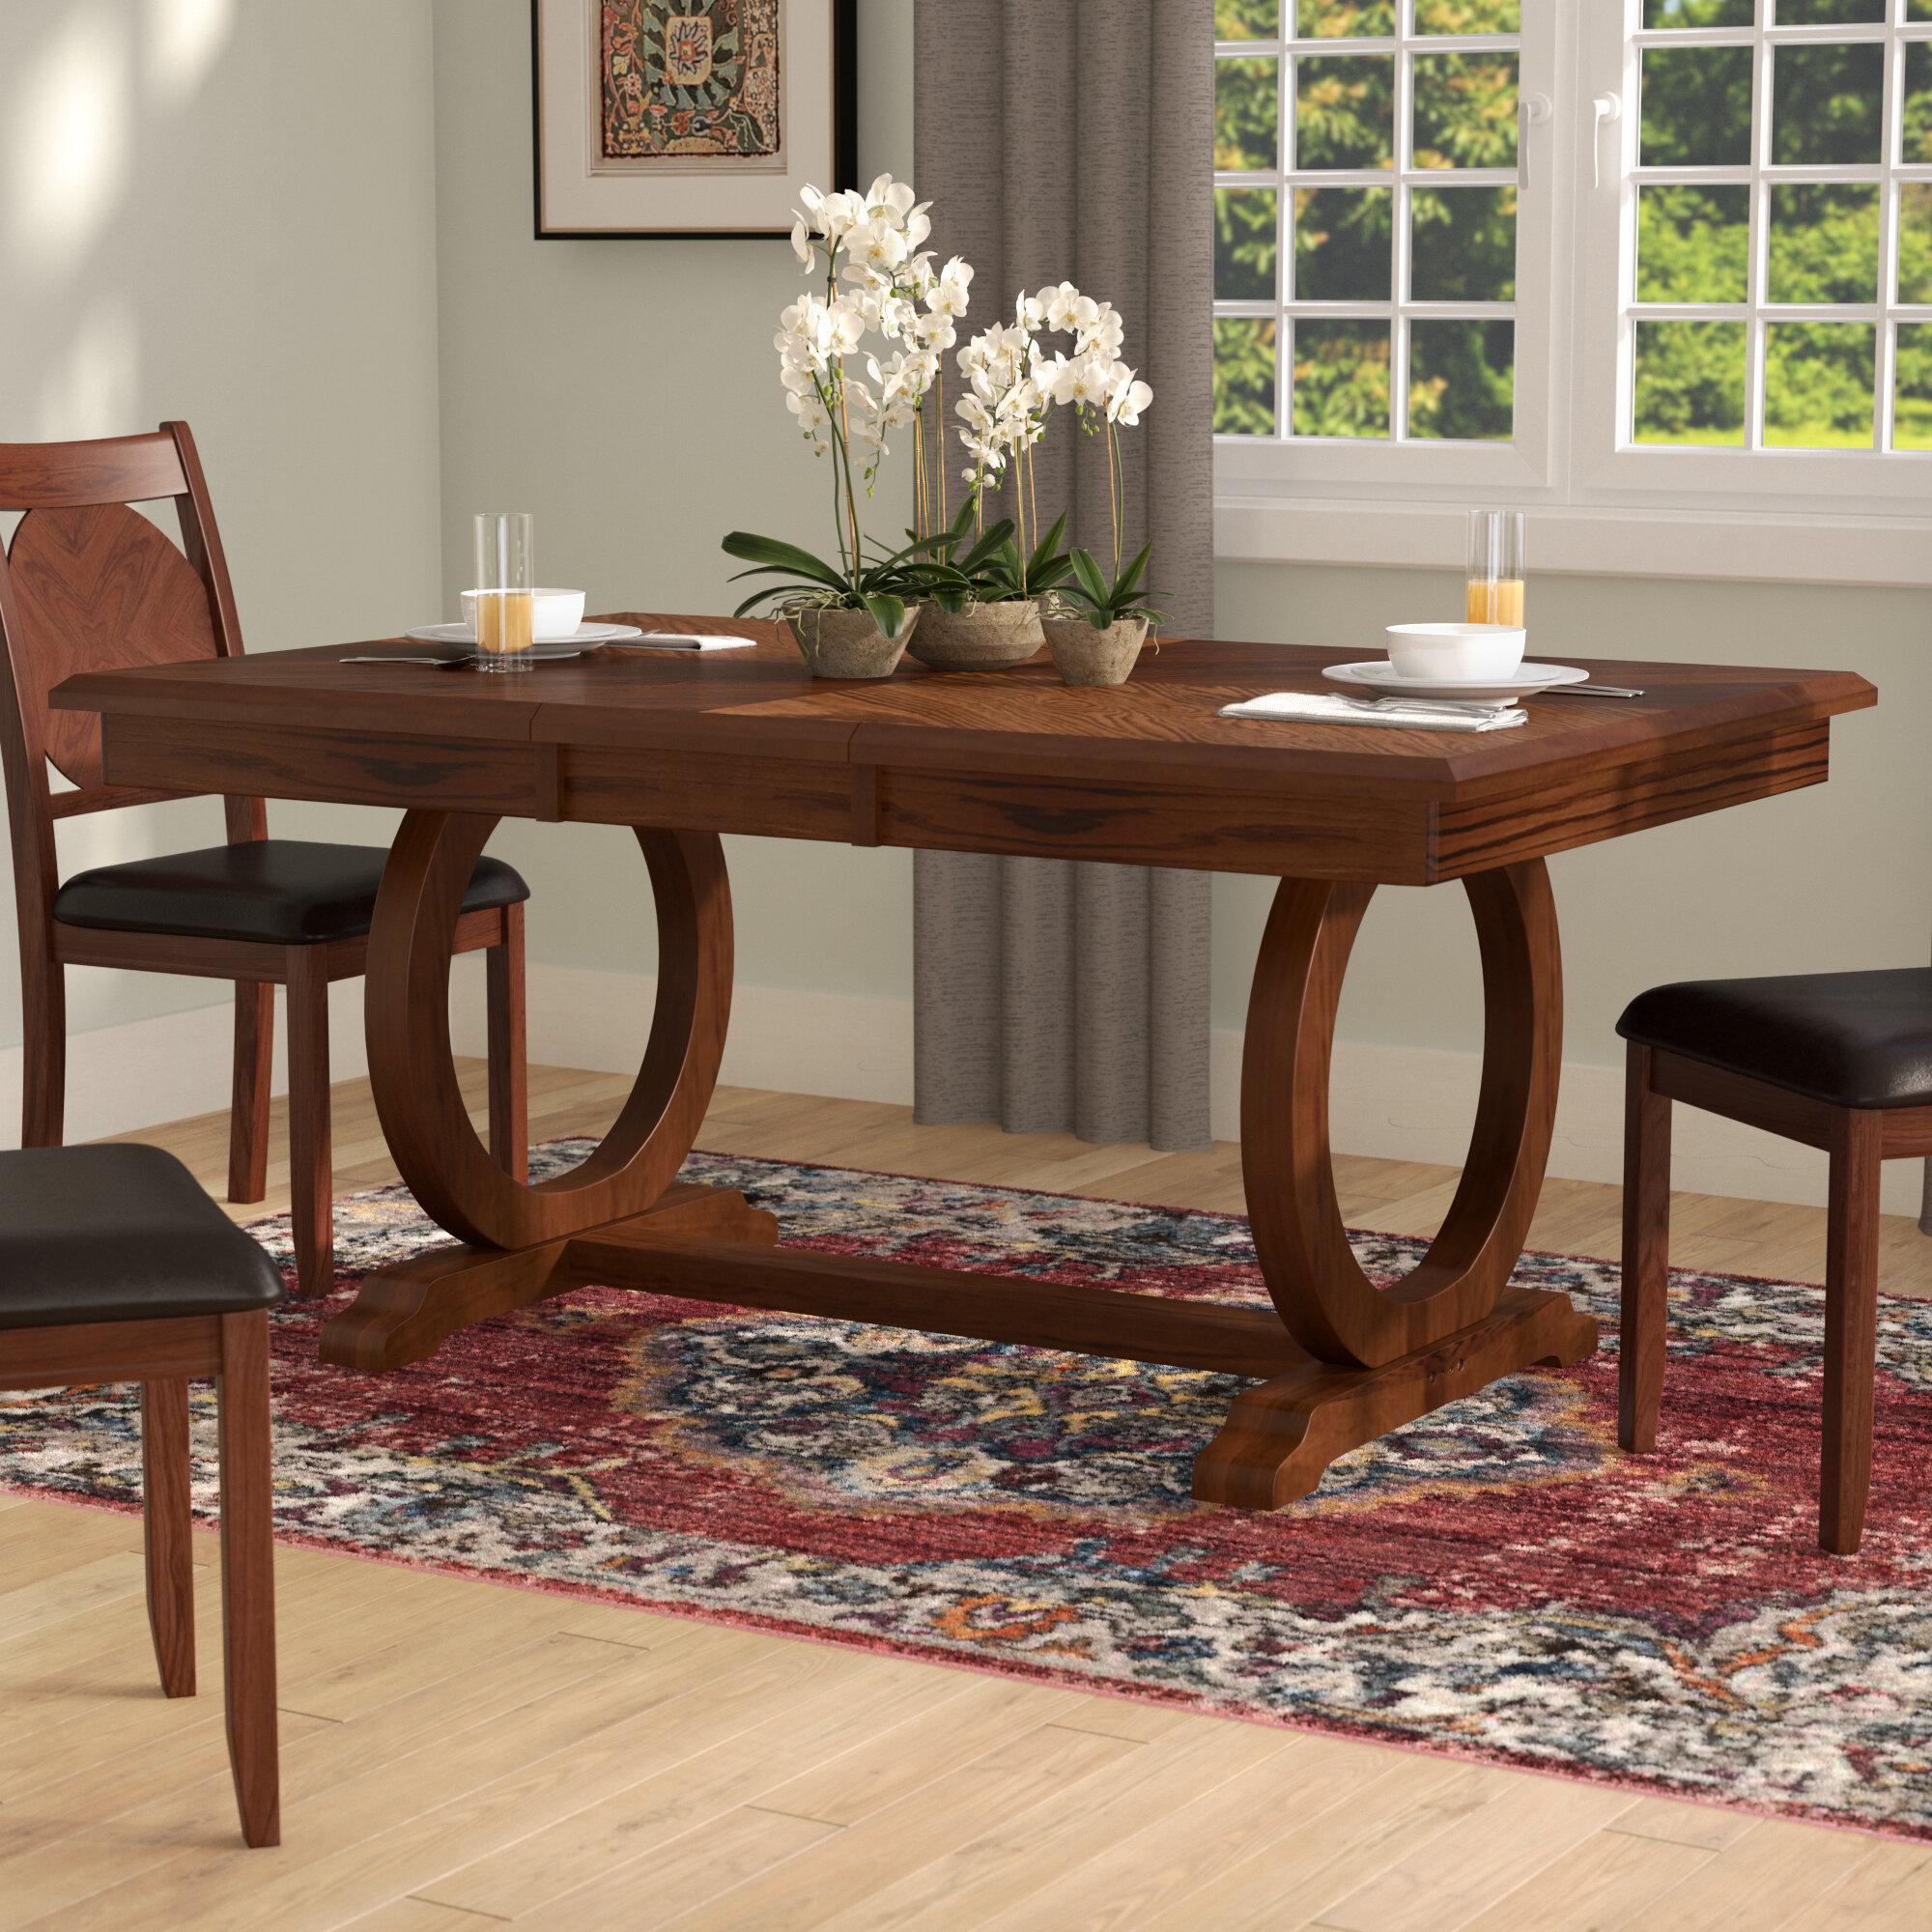 Merveilleux World Menagerie Kapoor Extendable Dining Table U0026 Reviews | Wayfair